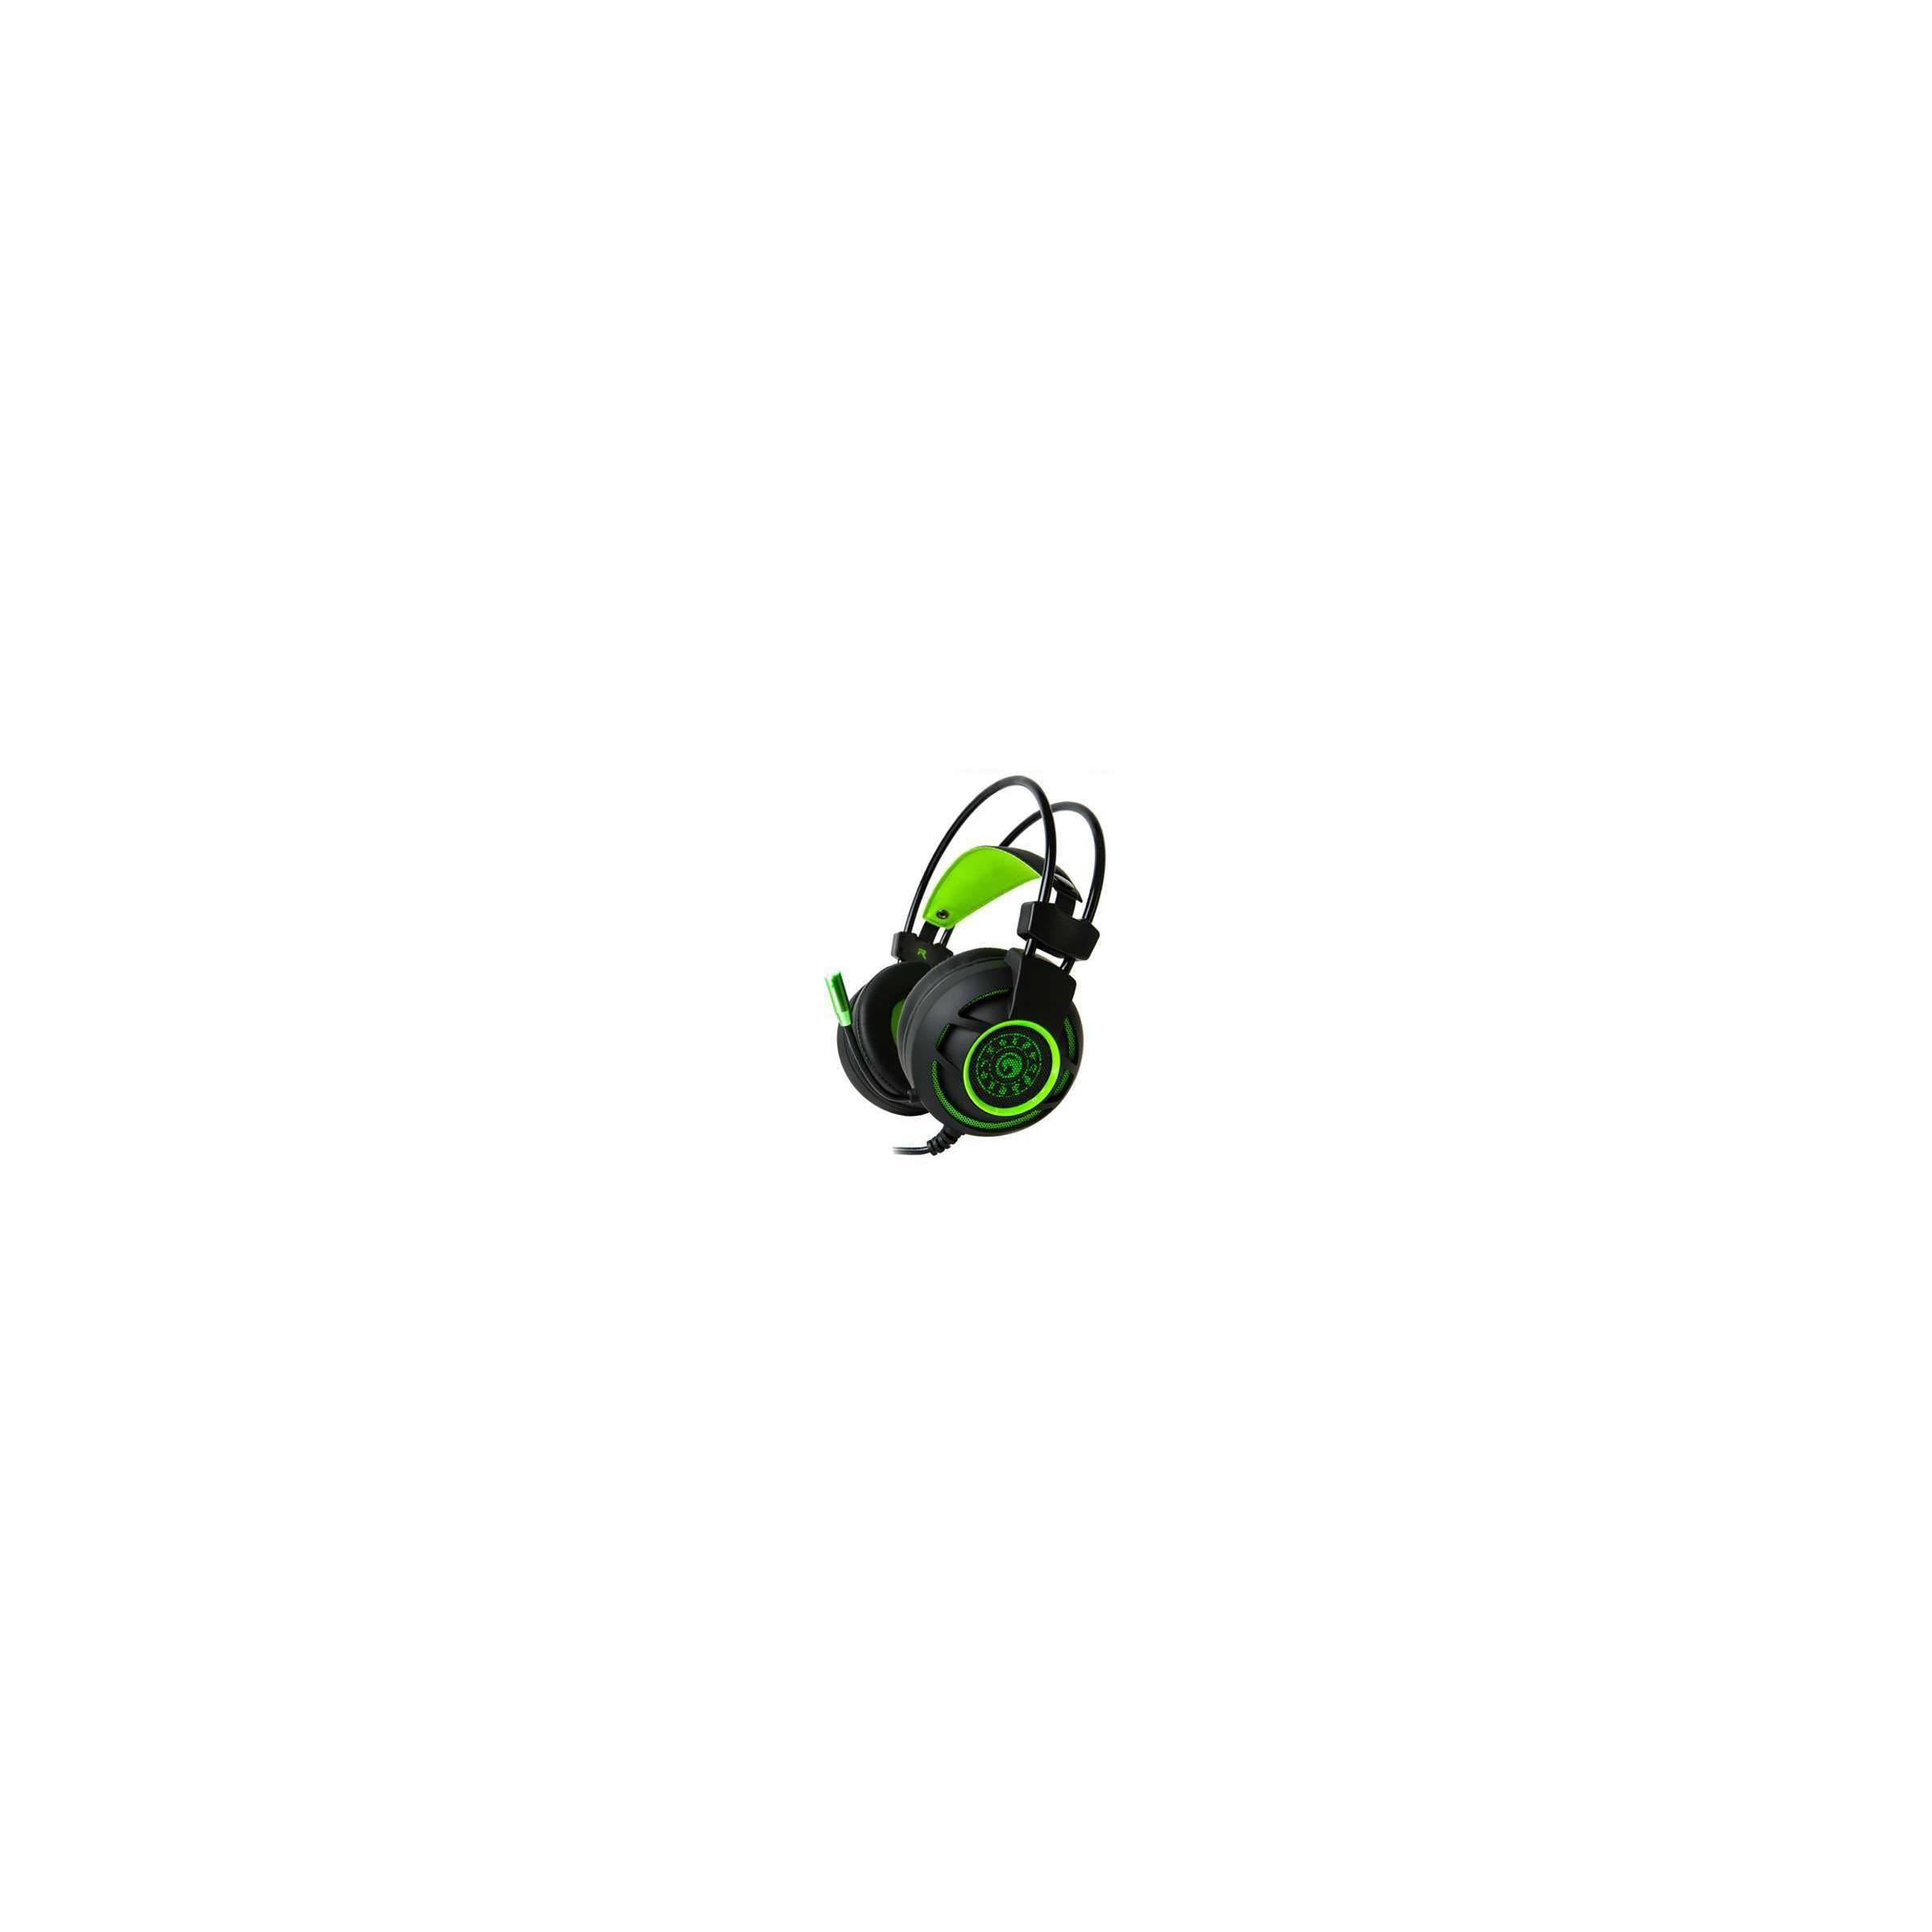 Marvo gaming headset hg9012 fra scorpion by marvo fra mackabler.dk